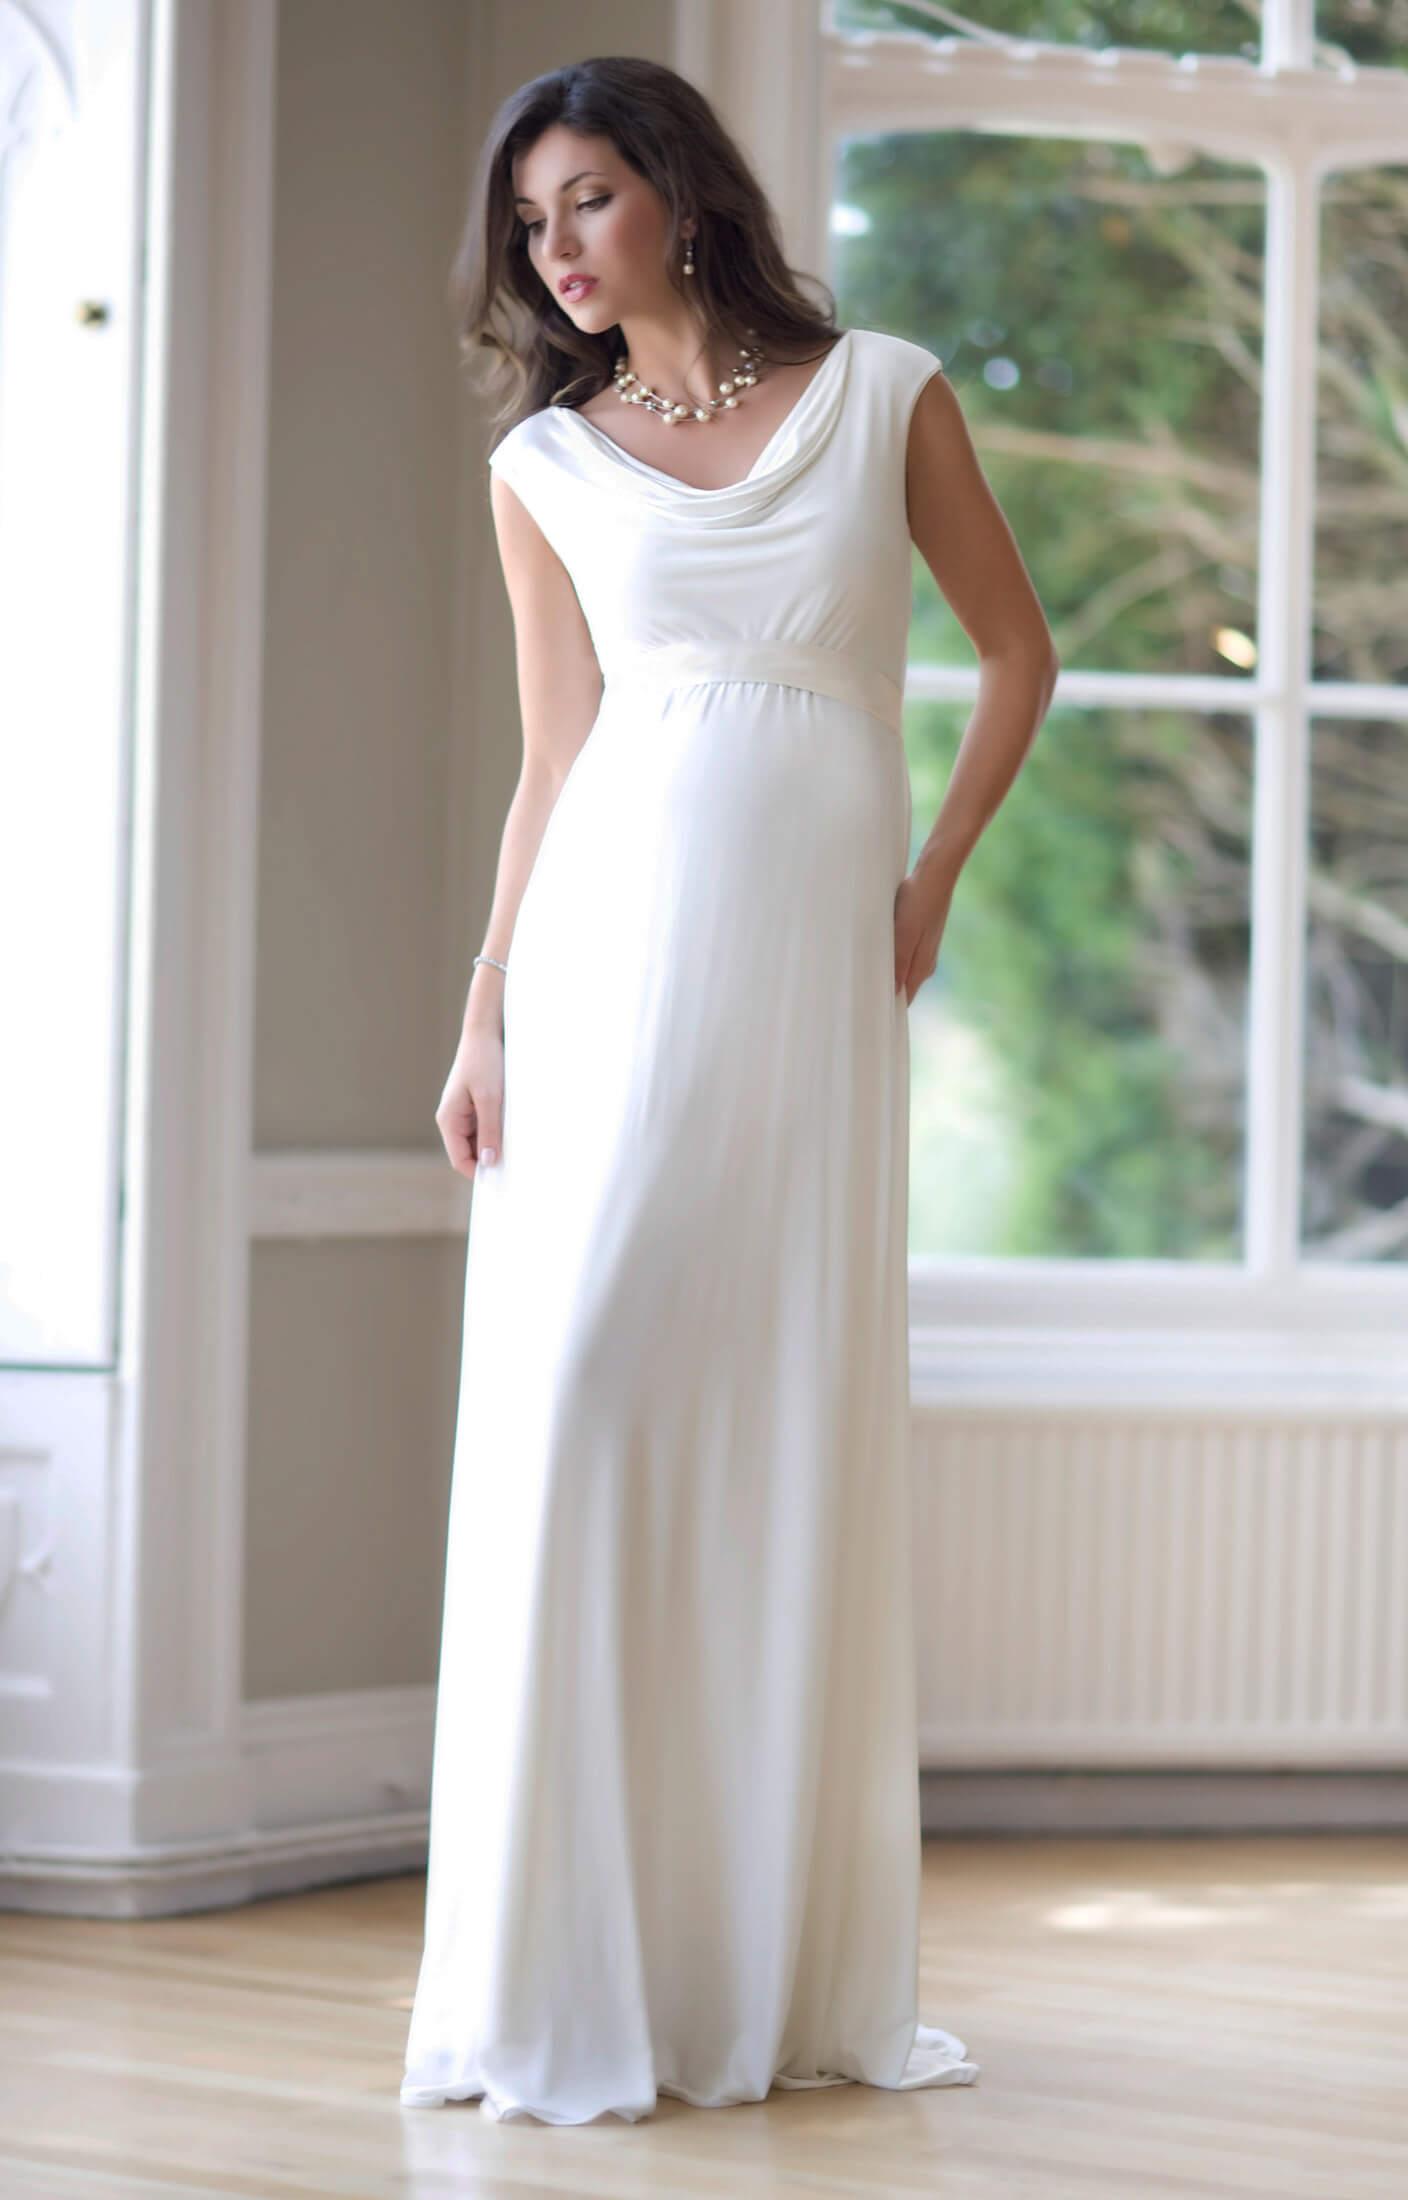 Liberty Maternity Wedding Gown (Ivory) ivory wedding dress Liberty Maternity Wedding Gown Ivory by Tiffany Rose